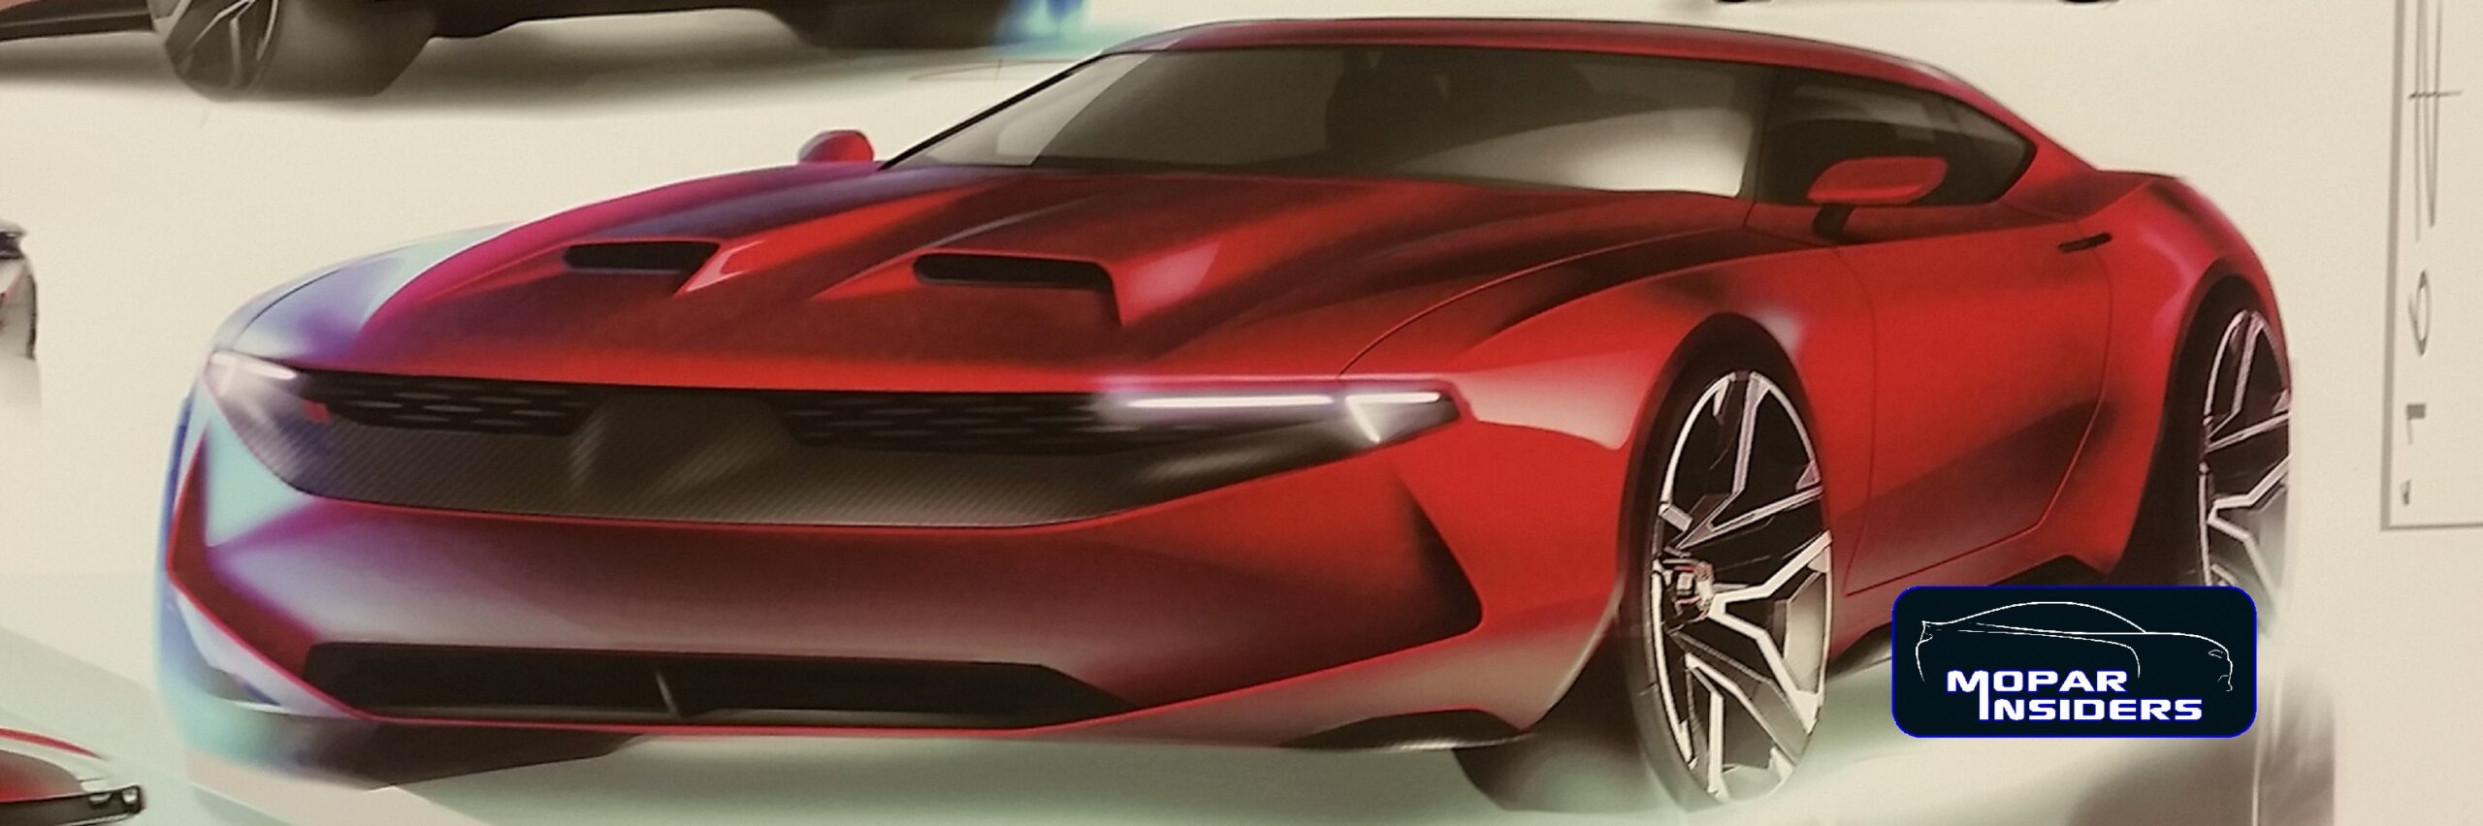 Overview 2022 Dodge Barracuda